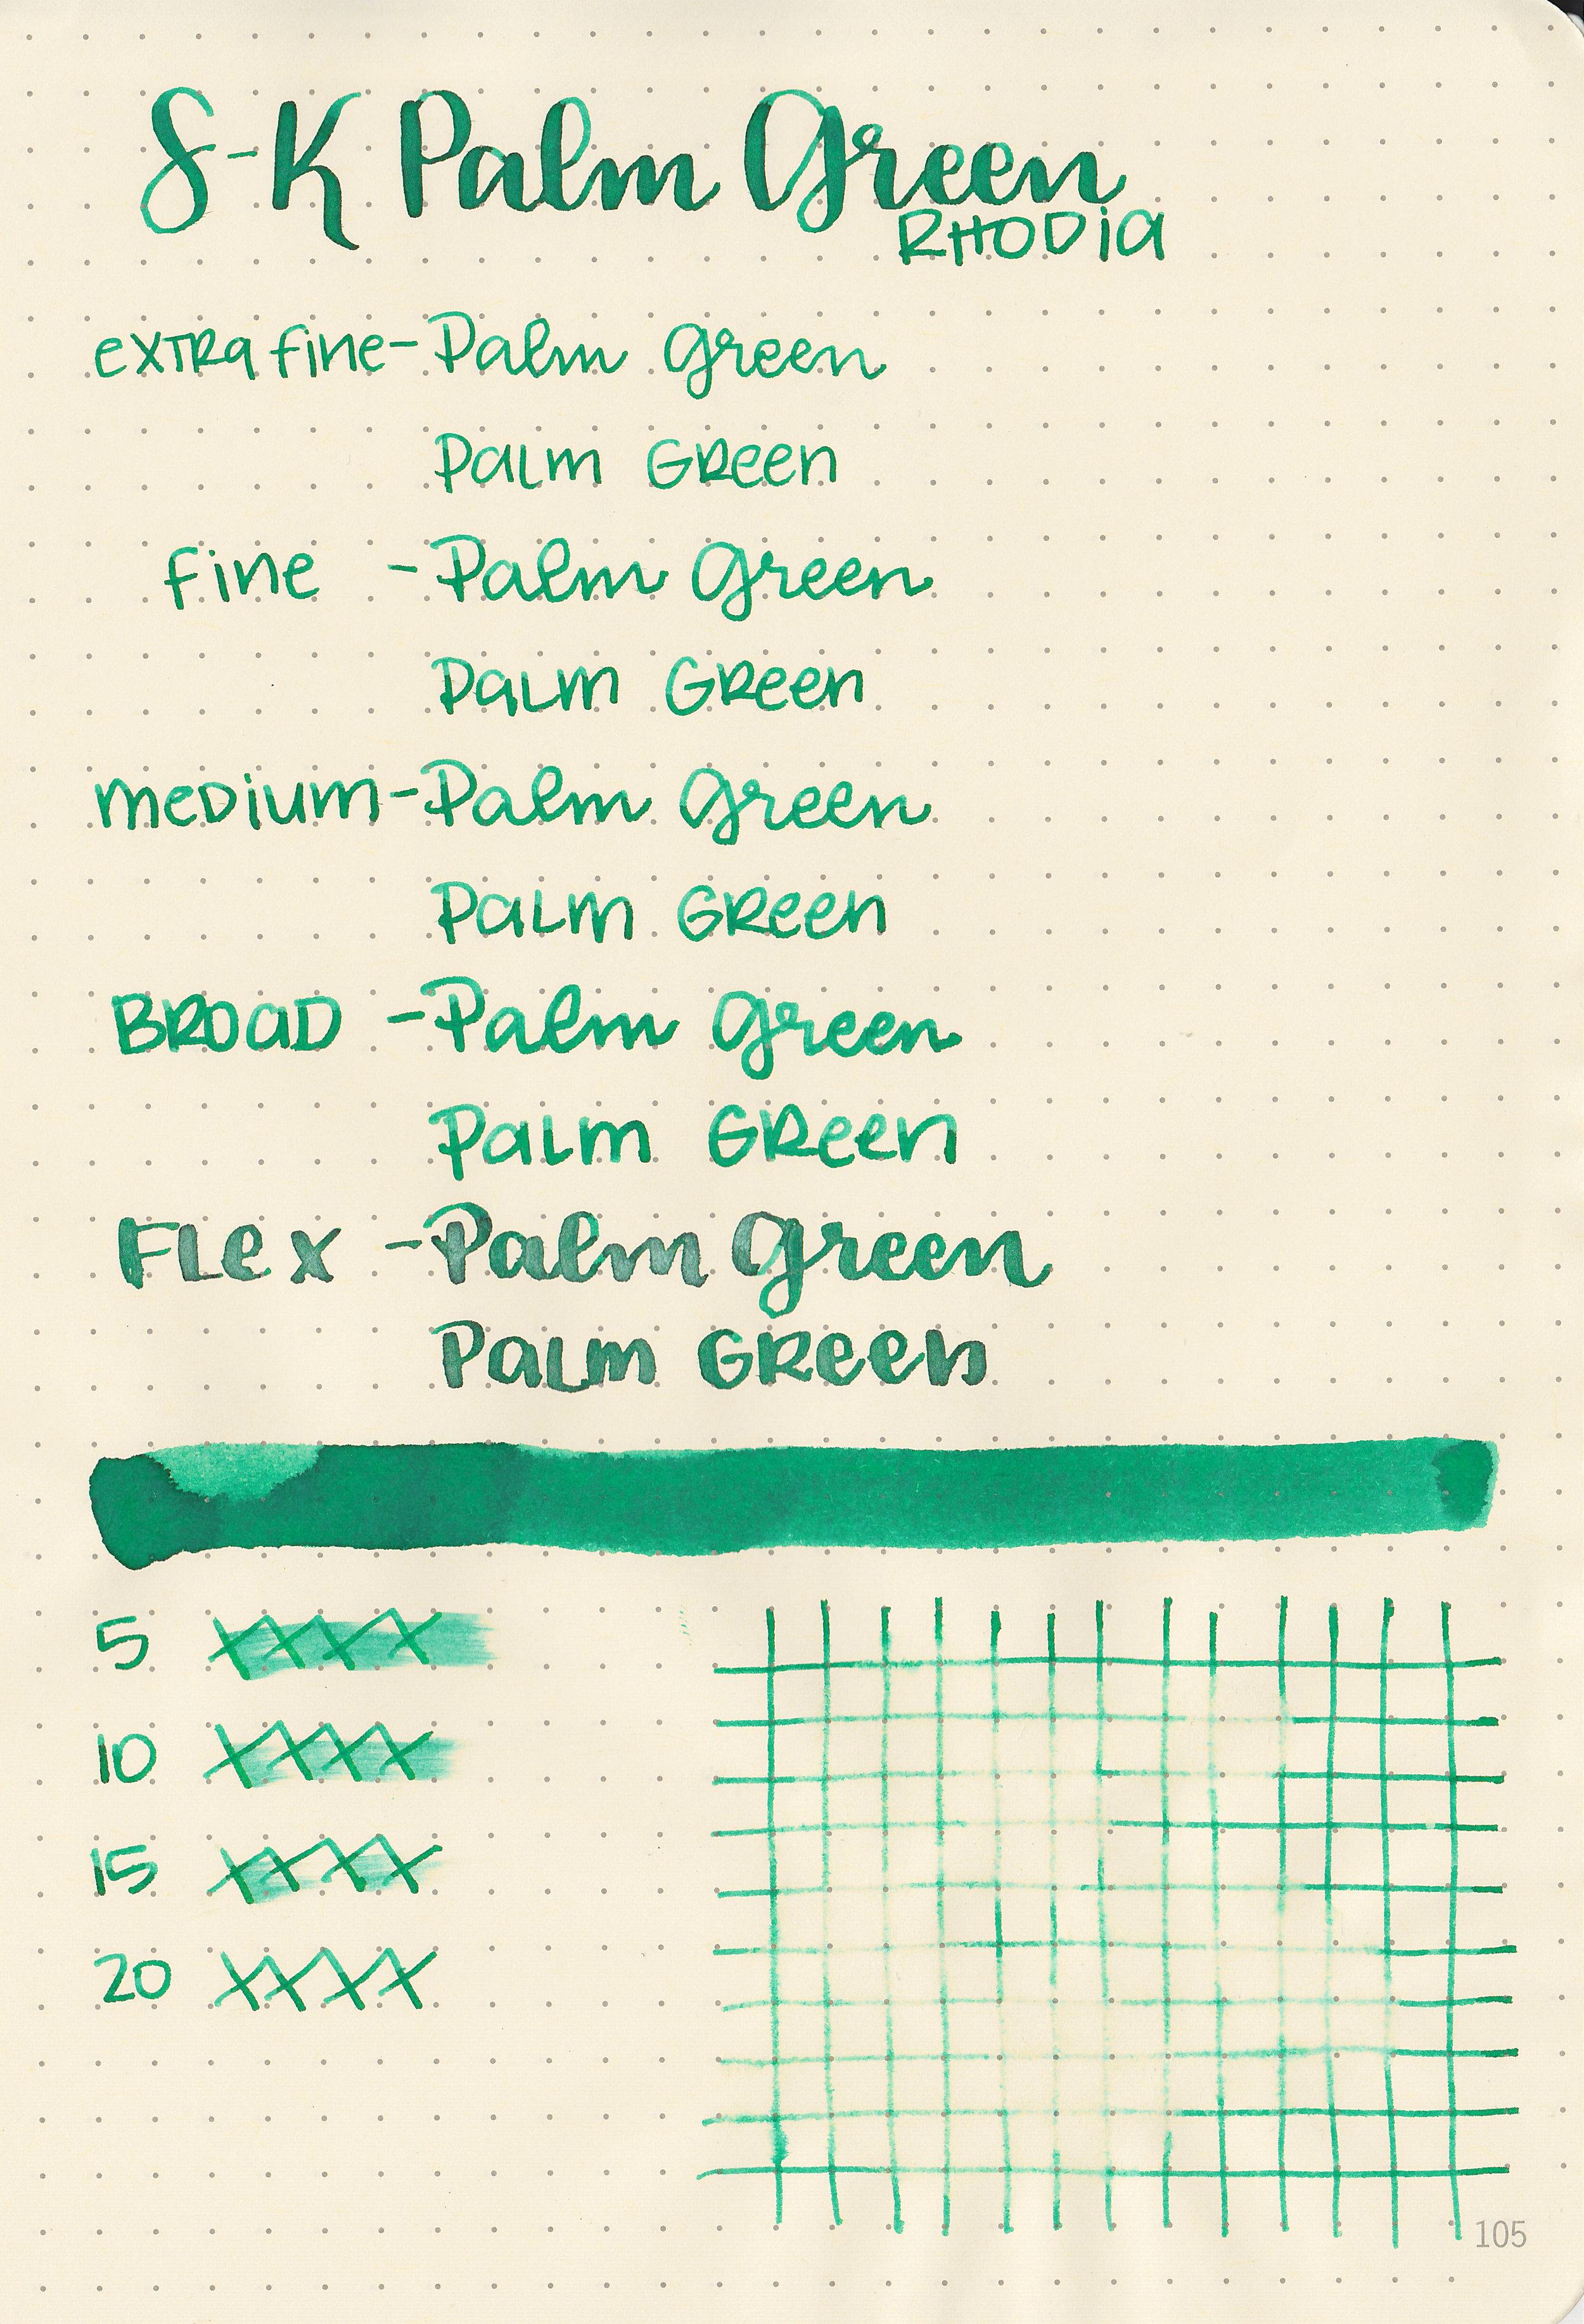 sk-palm-green-7.jpg